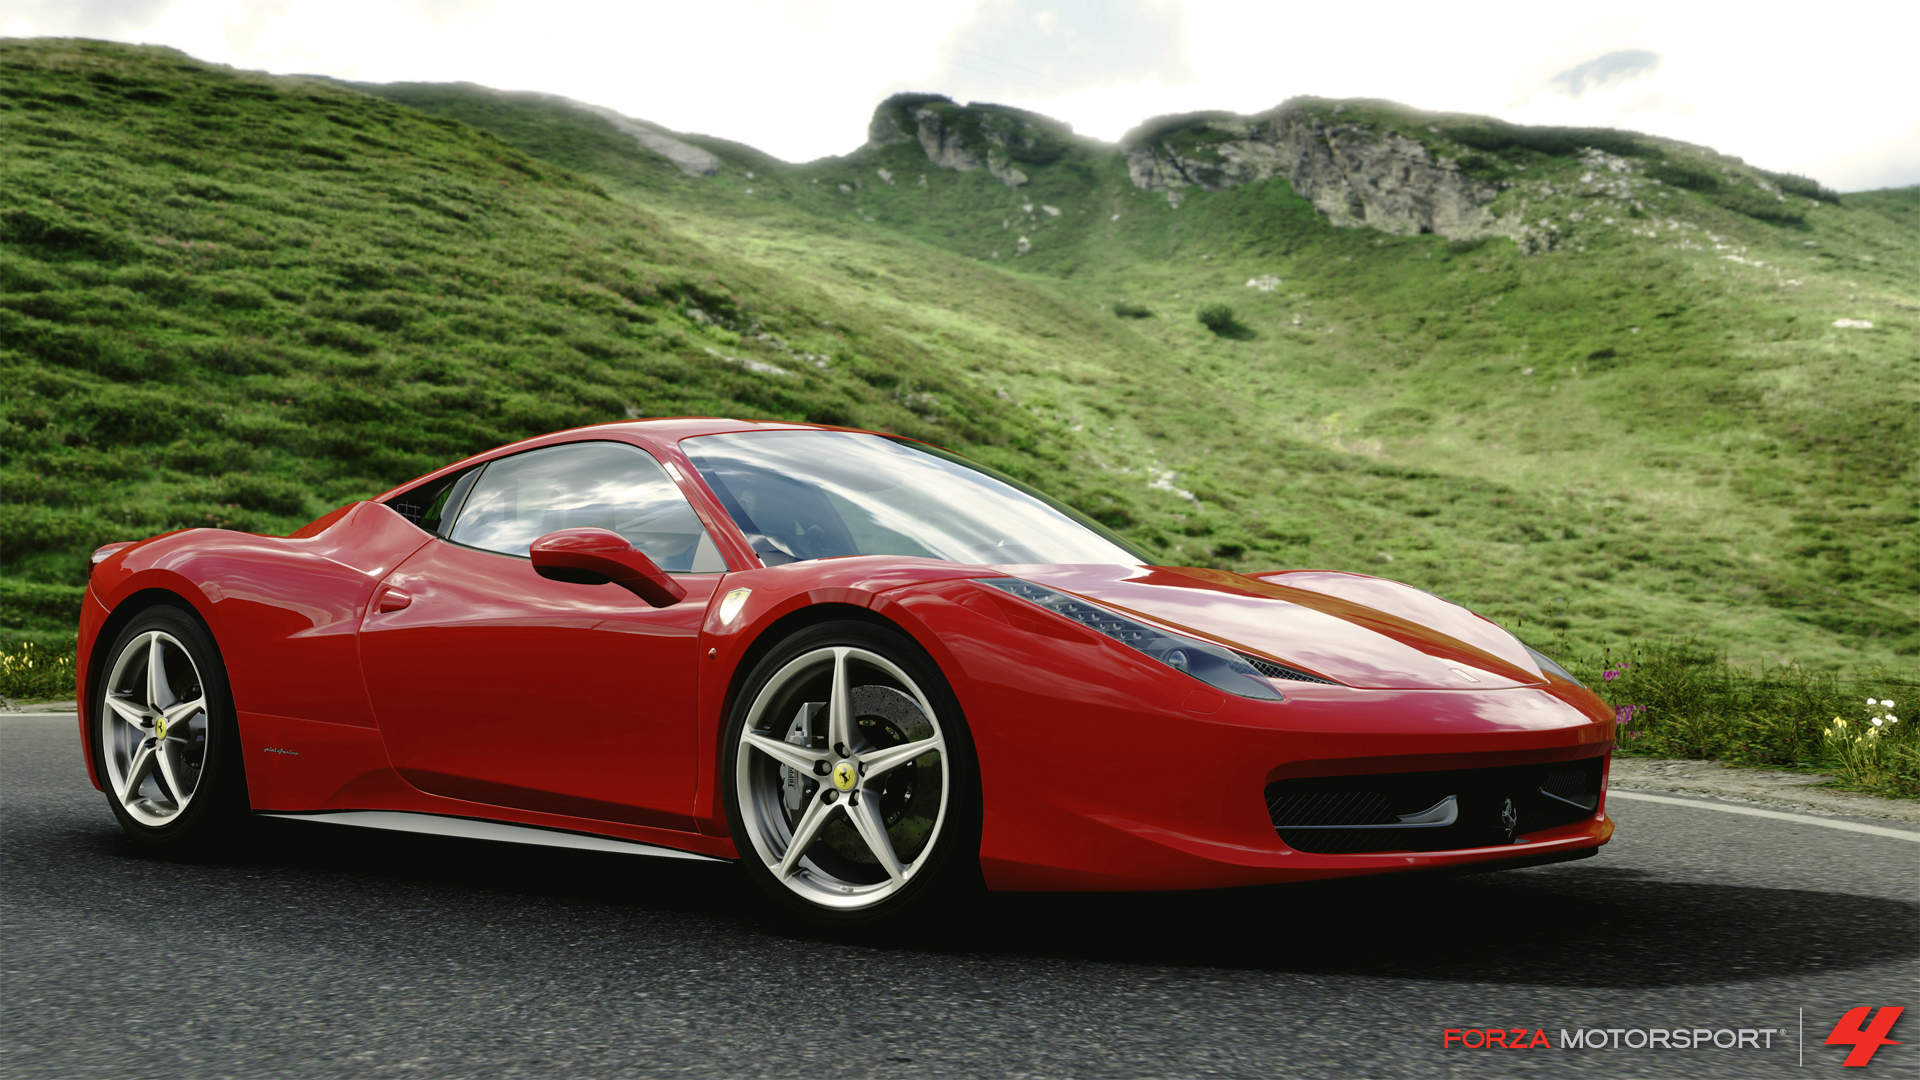 ferrari 458 spider hd wallpapers pictures hd wallpapers - Ferrari 458 Spider Green